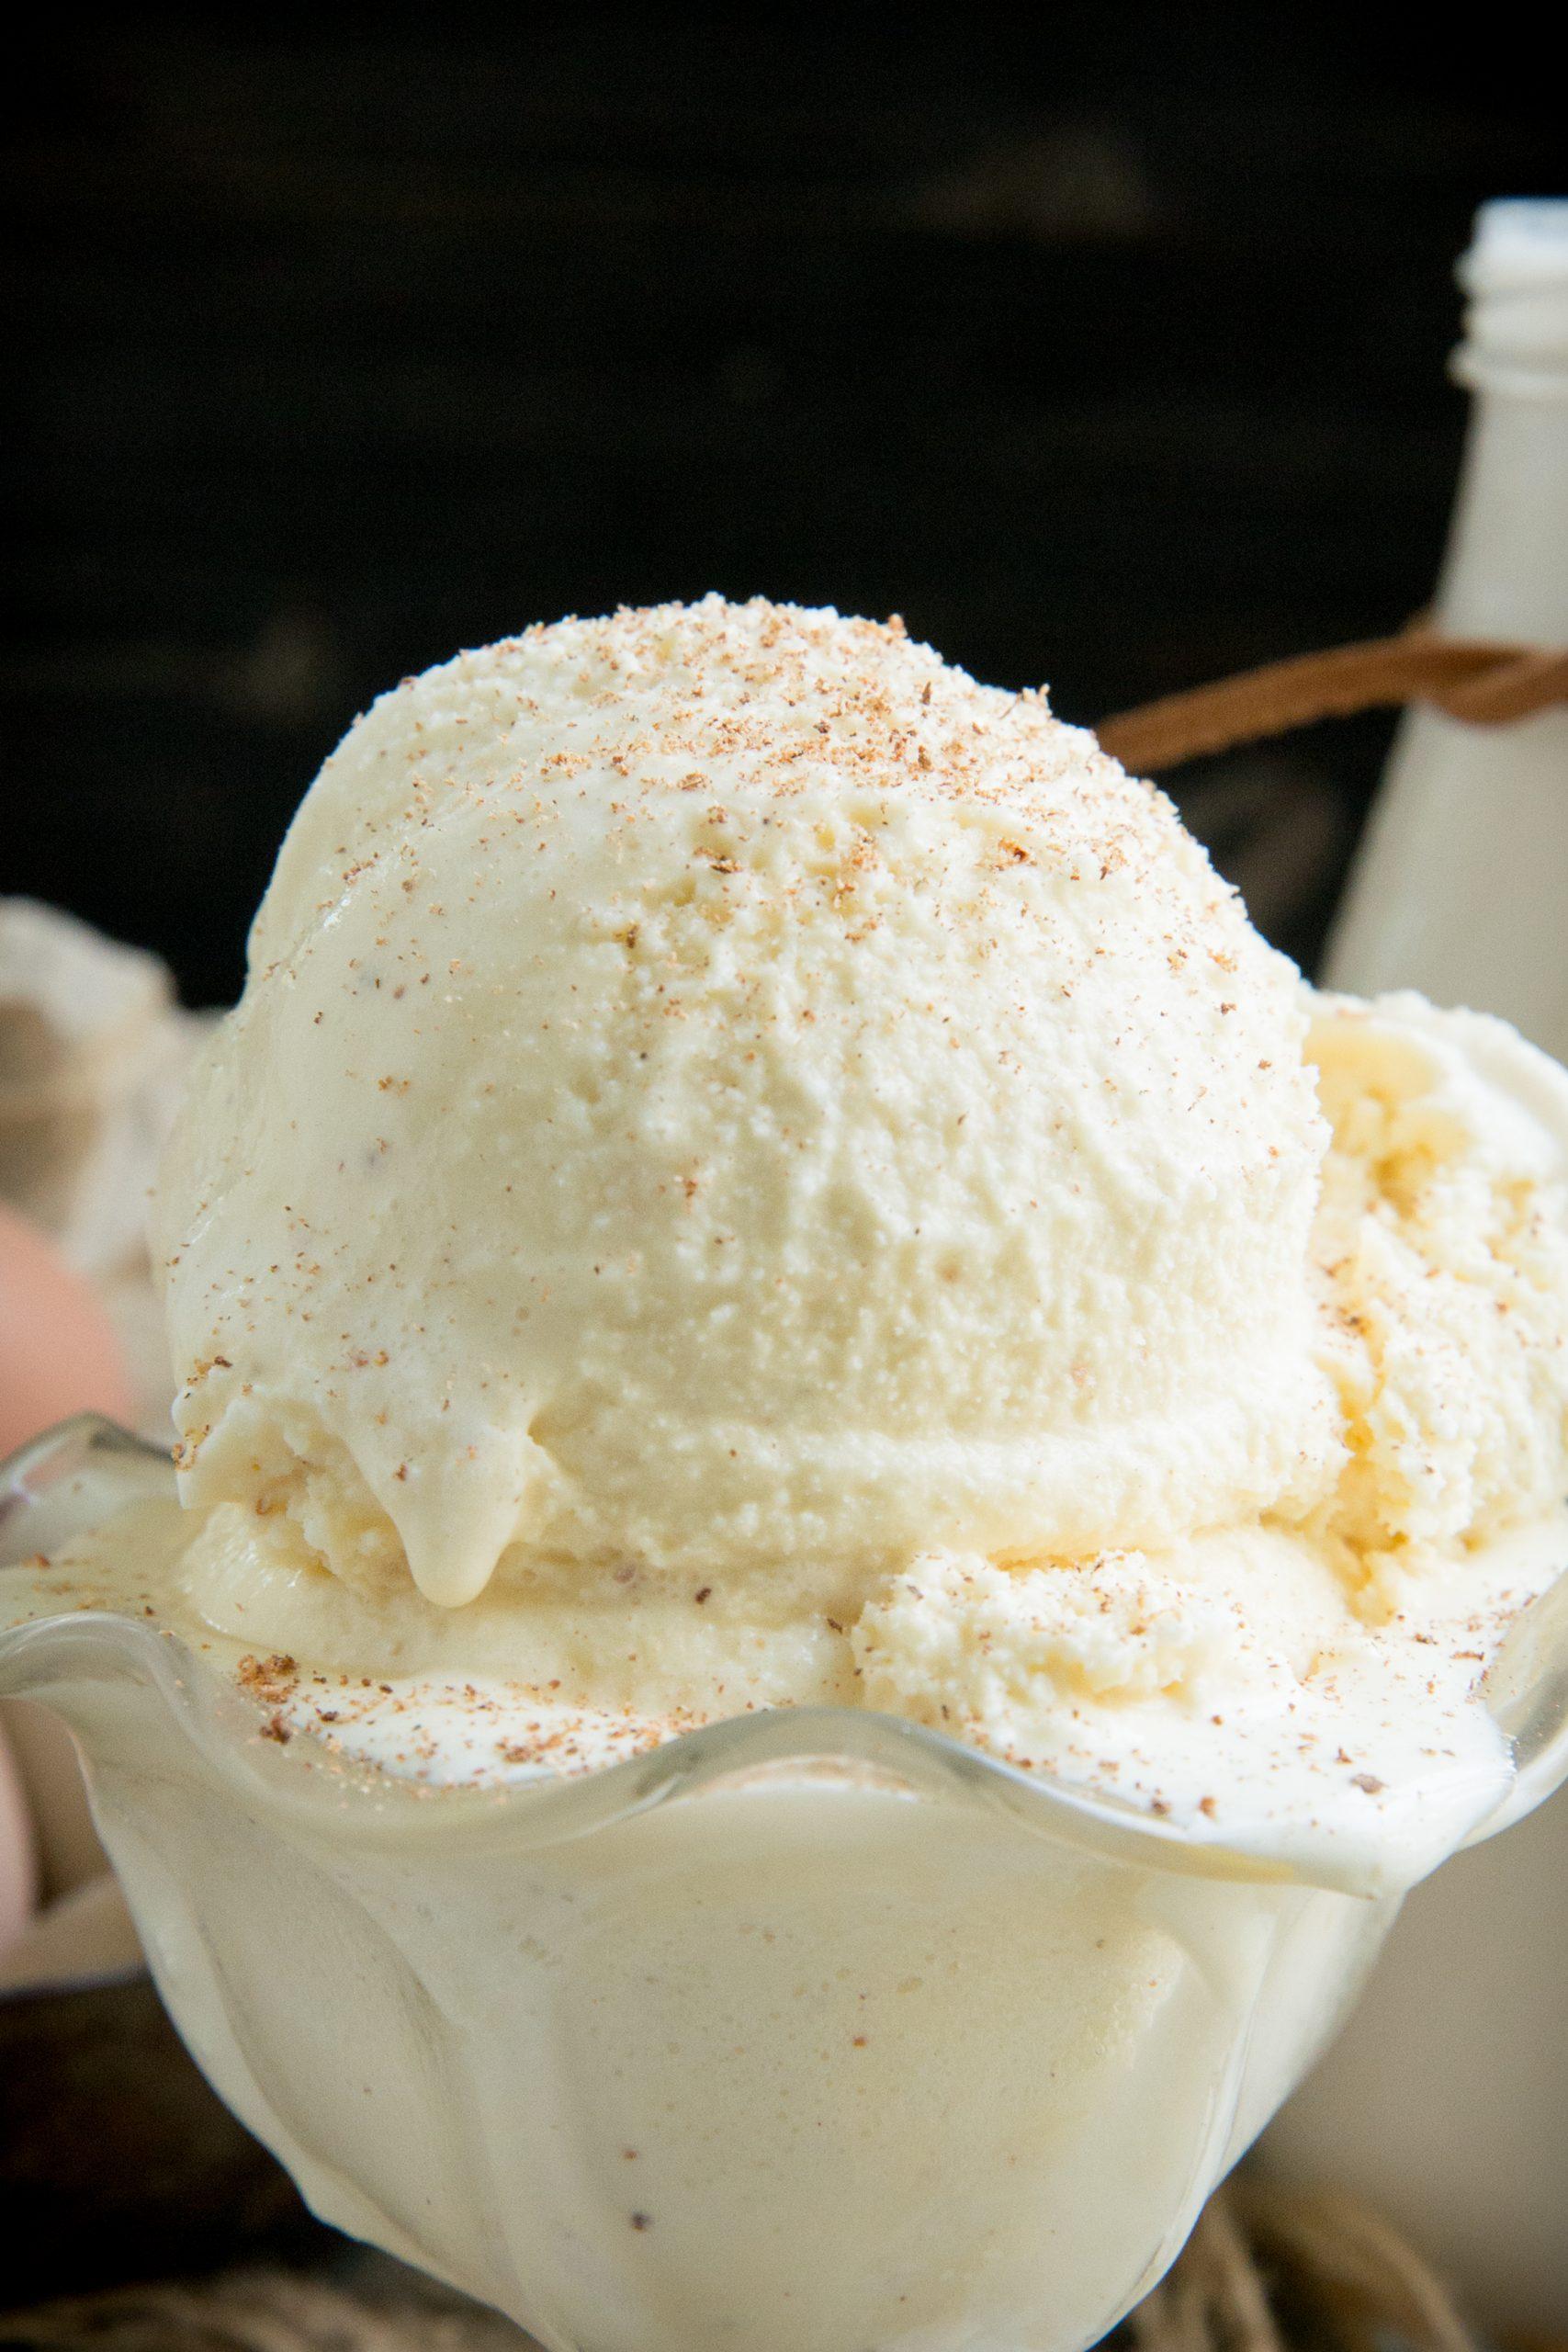 Nutmeg sprinkled over eggnog ice cream